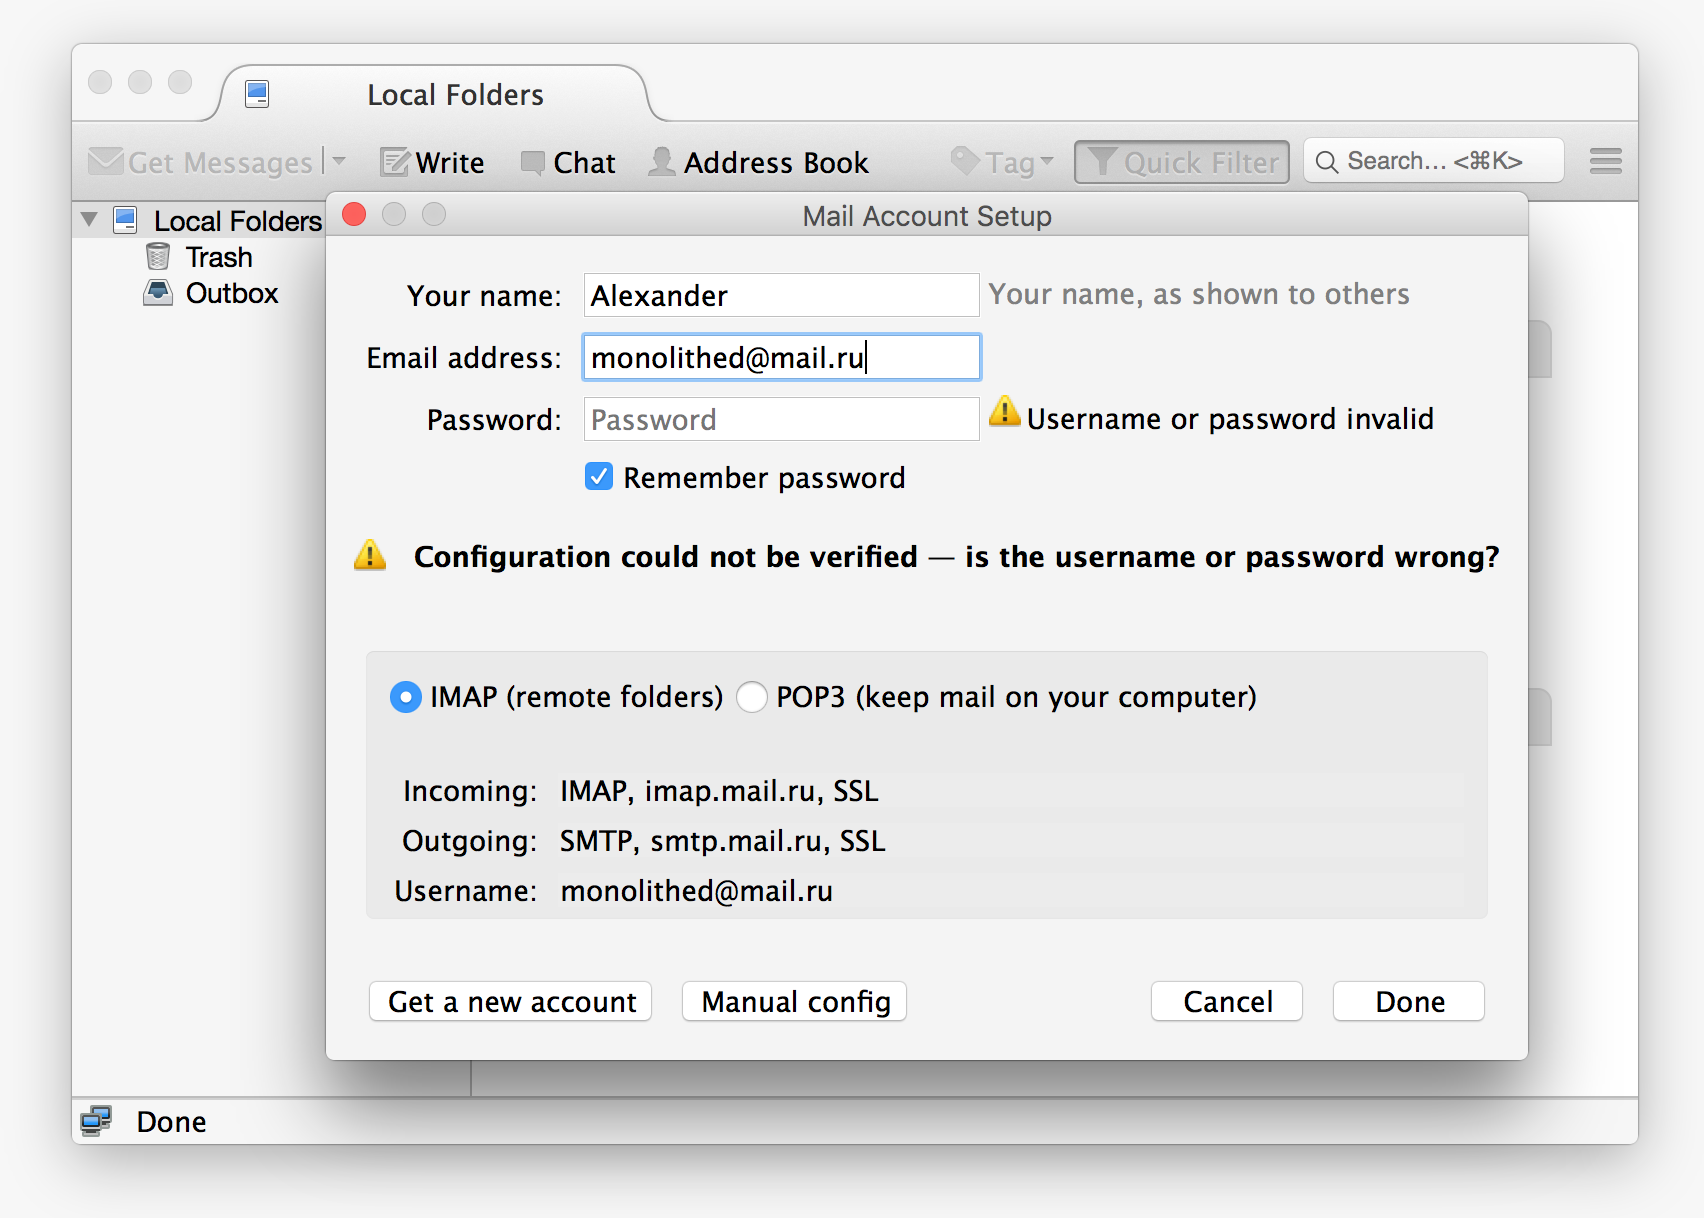 OAuth-авторизация в Mozilla Thunderbird: от зарождения до релиза - 5